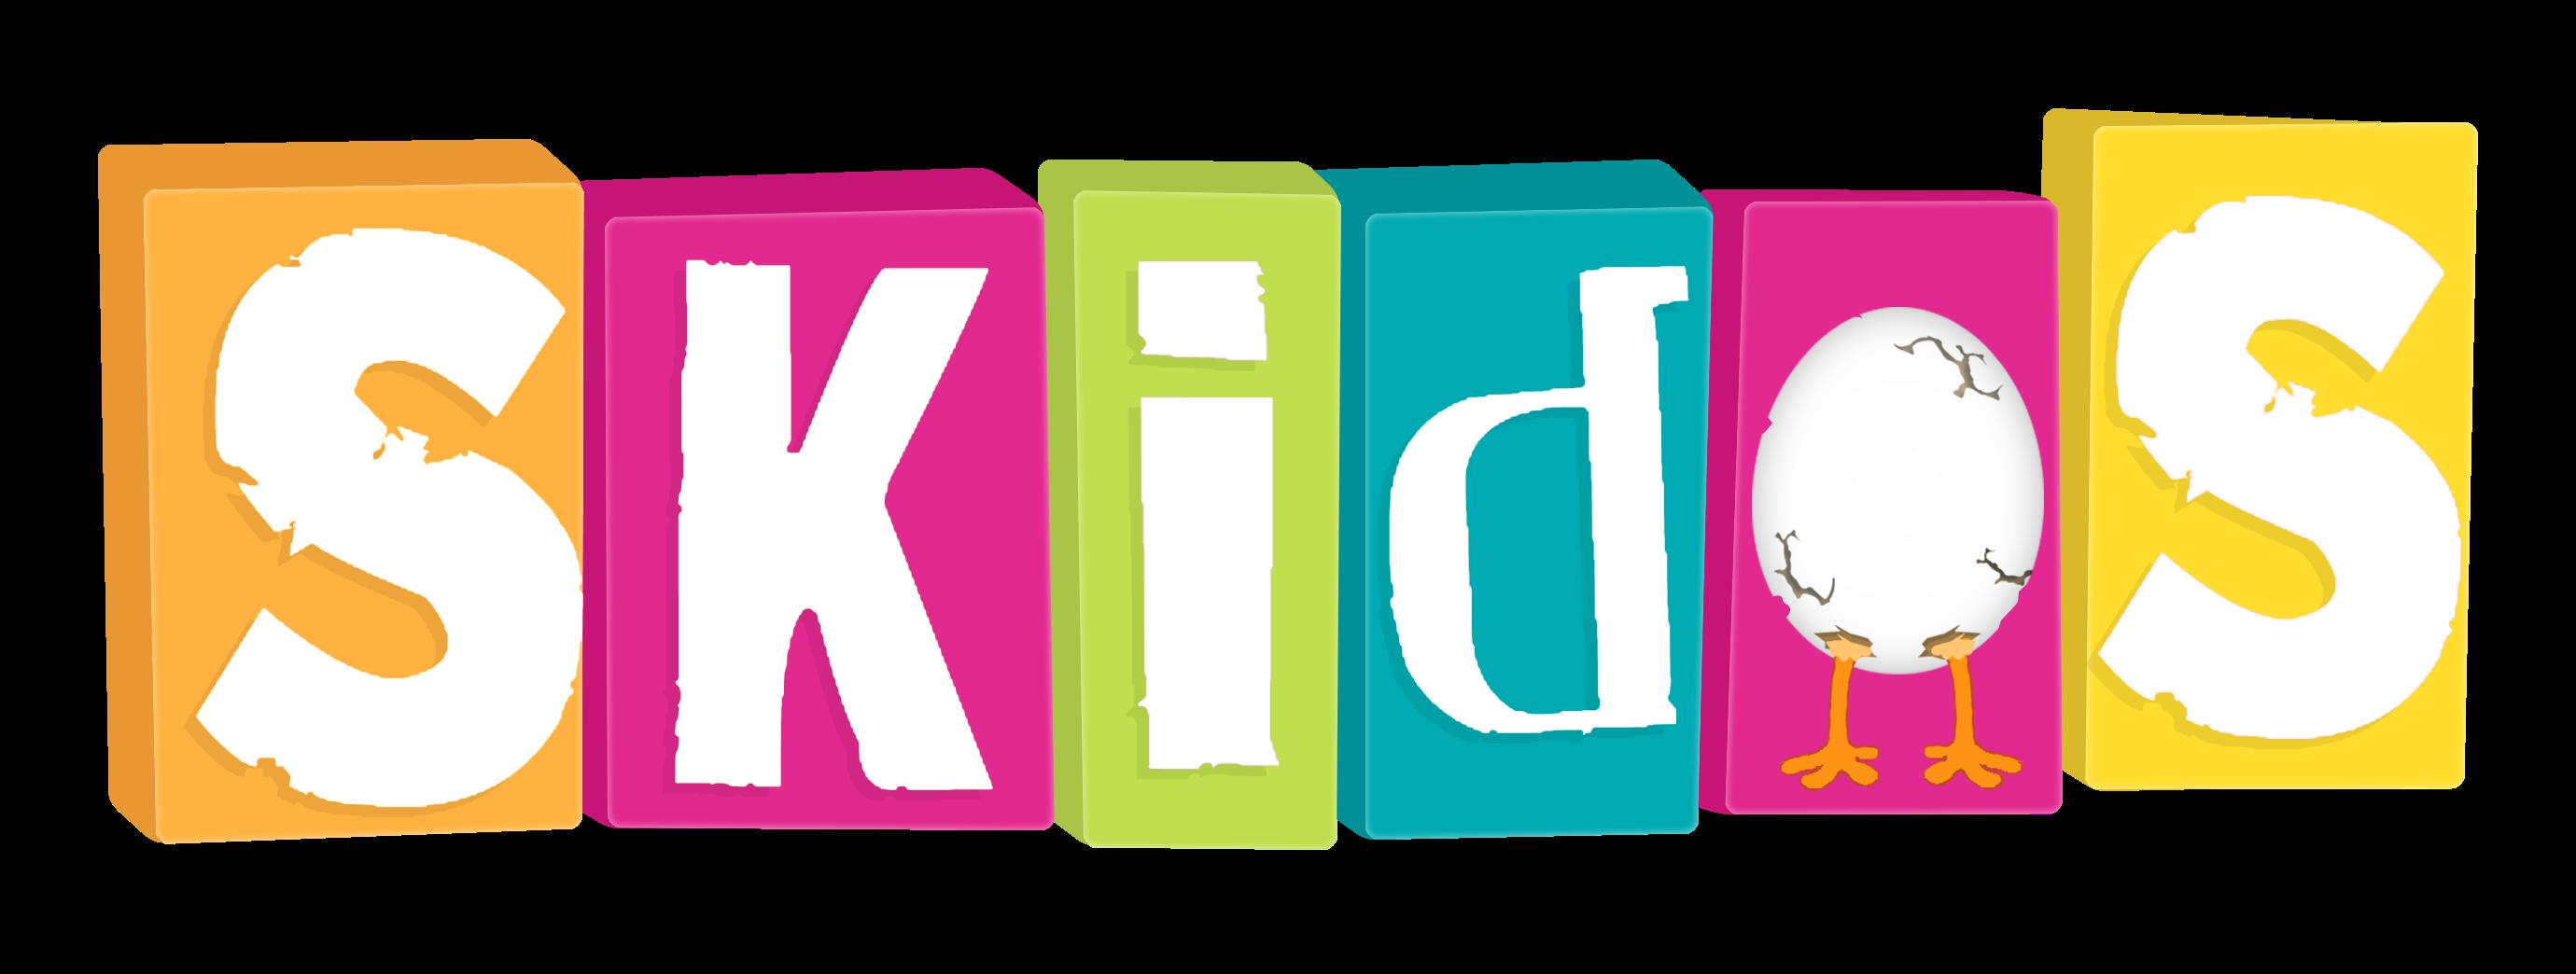 Skidos Labs Educational games kids love